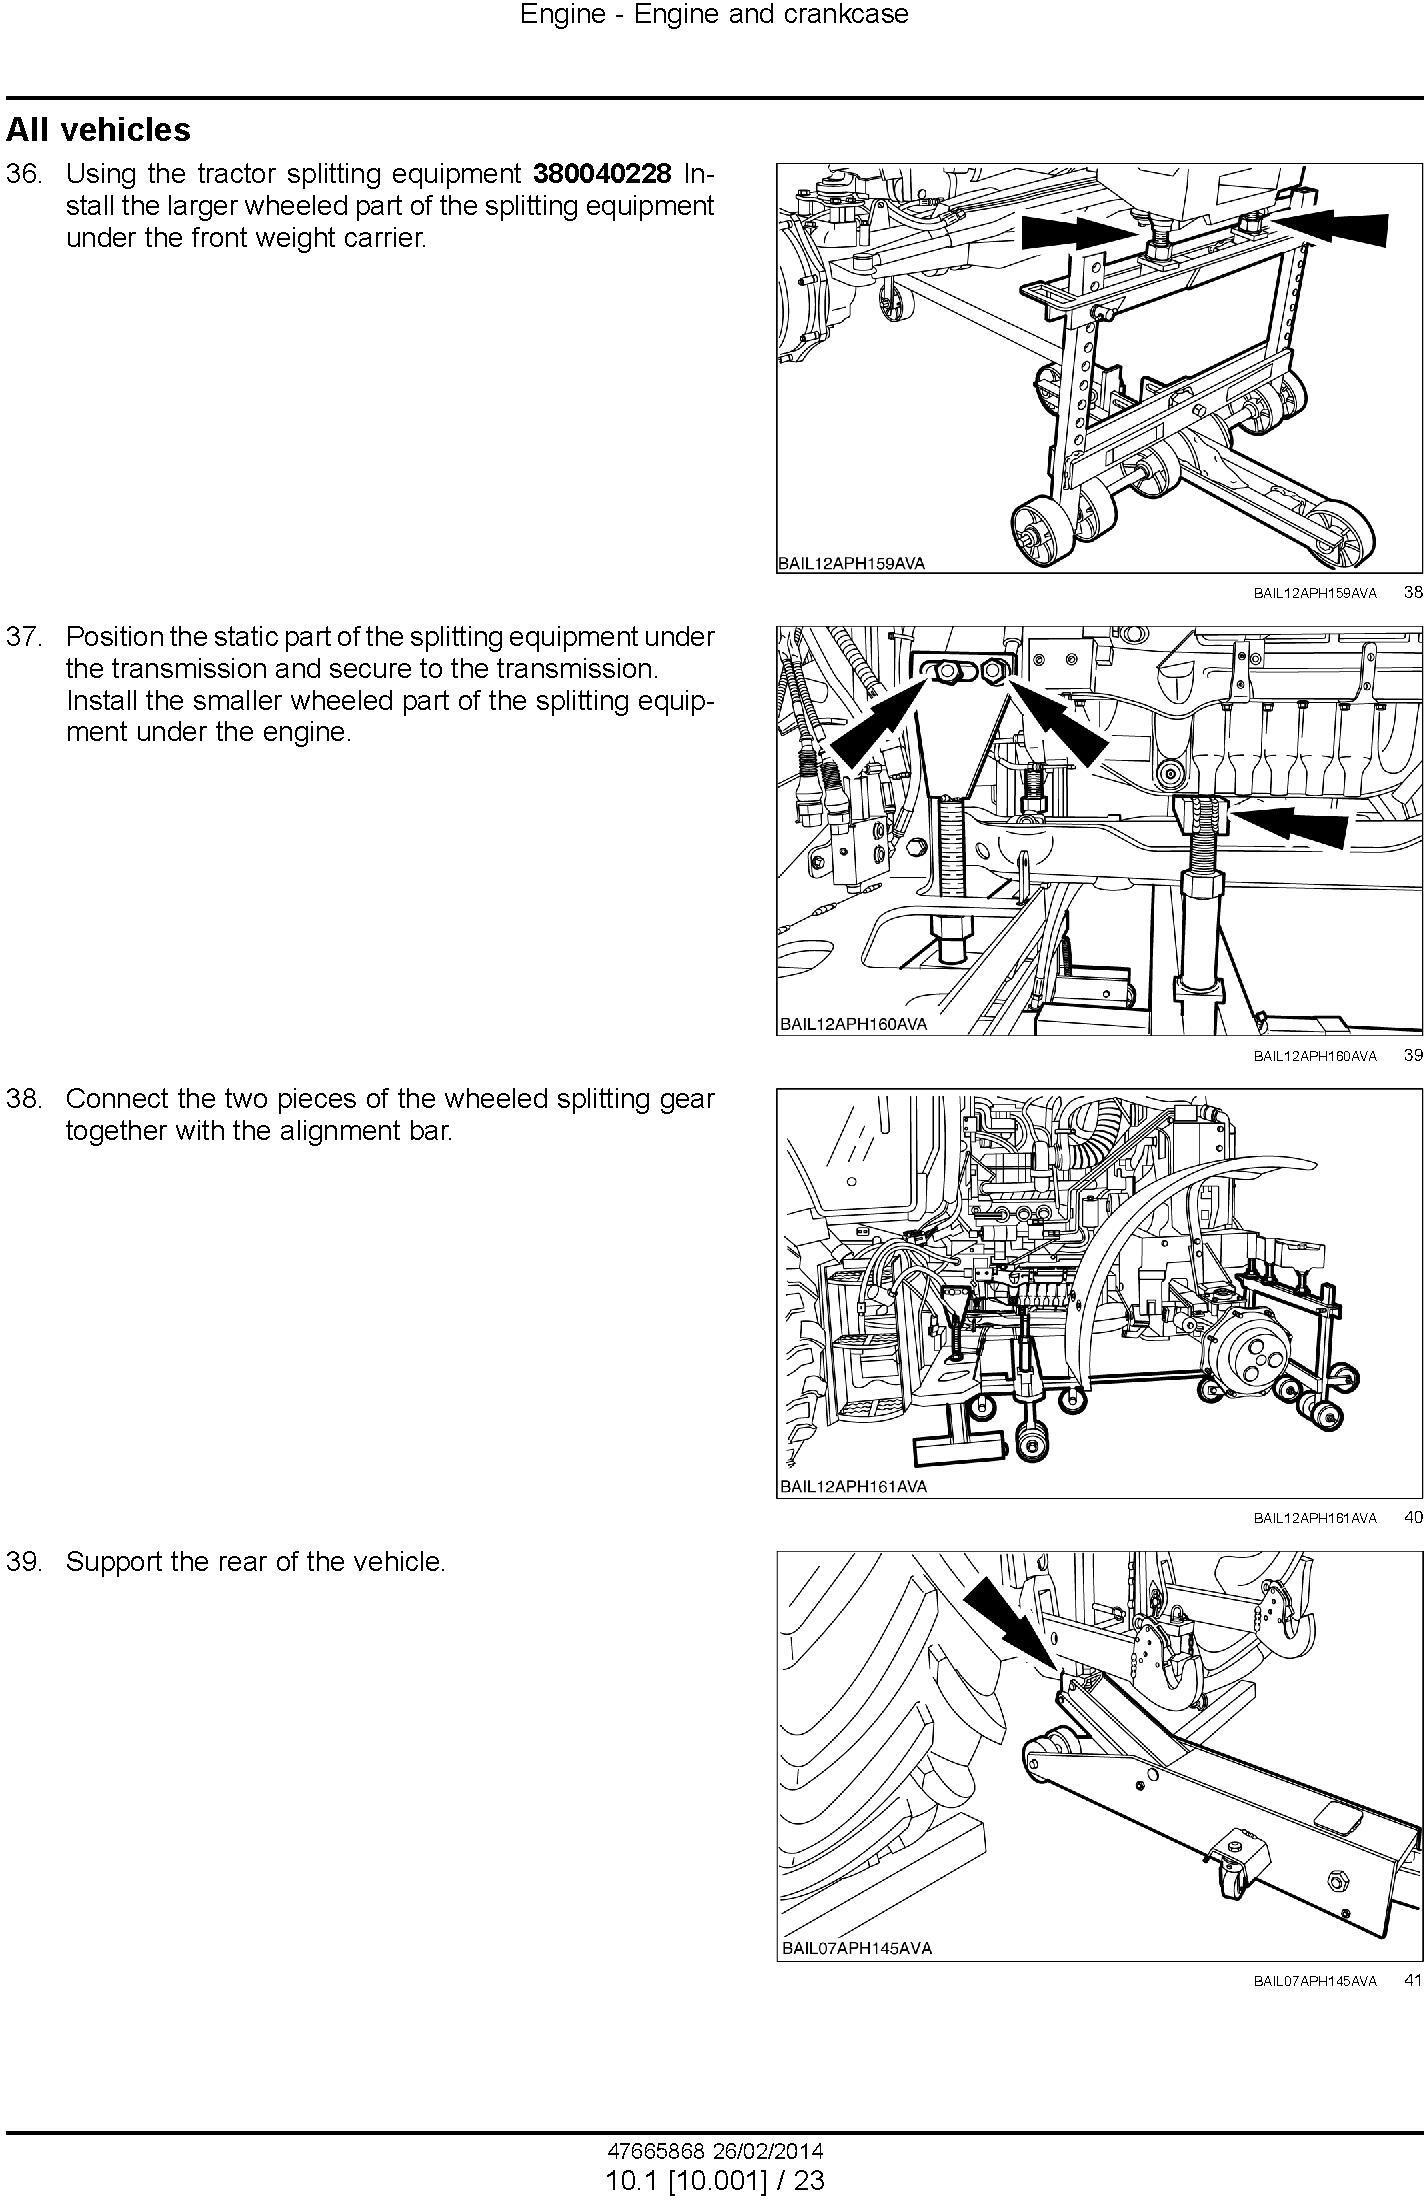 New Holland T6.120, T6.140, T6.150, T6.155, T6.160, T6.165,T6.175 All Regions Tractor Service Manual - 1